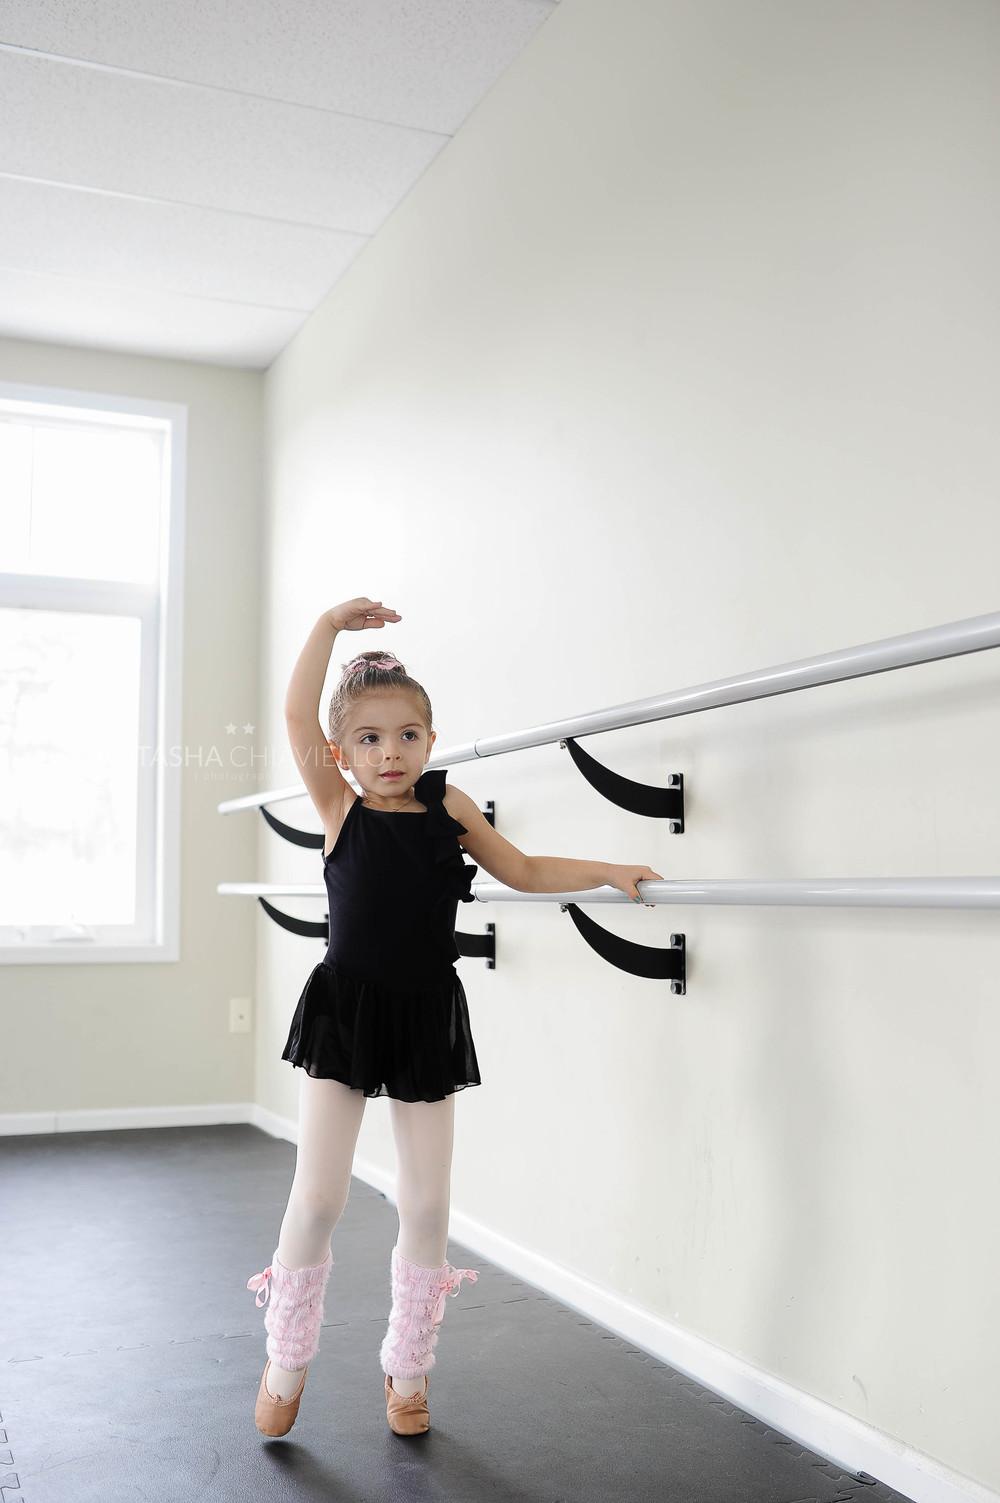 Aria_Ballerina_NCP_Proofs-1.jpg